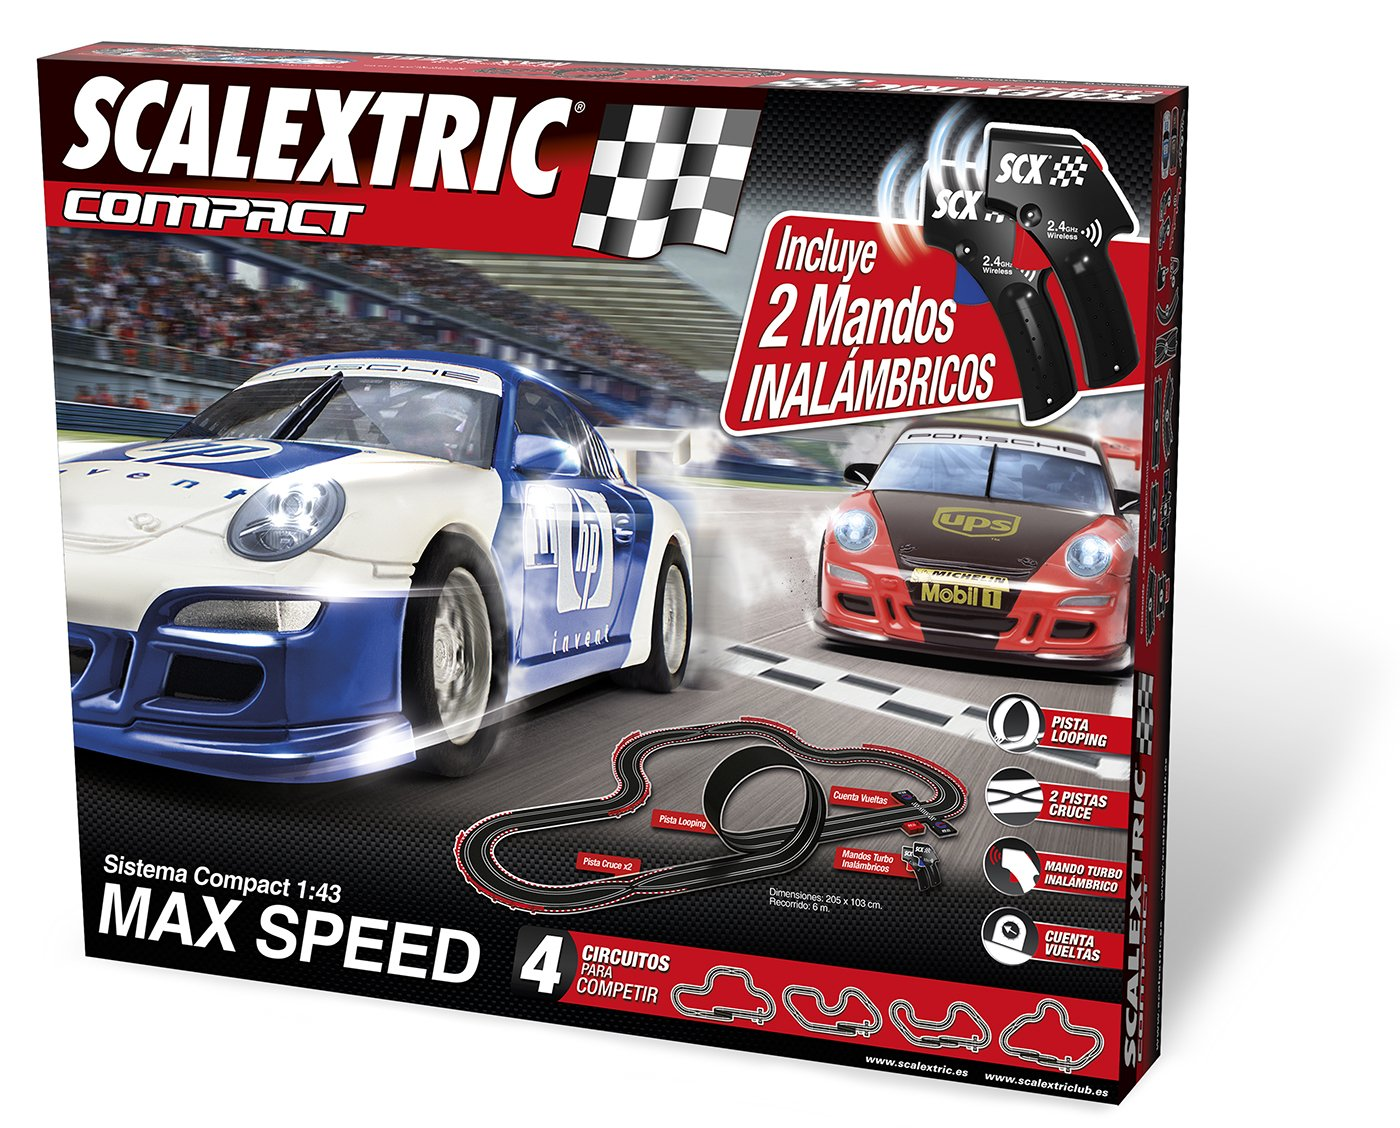 Circuito Scalextric Compact Max Speed inalámbrico por solo 104,51€